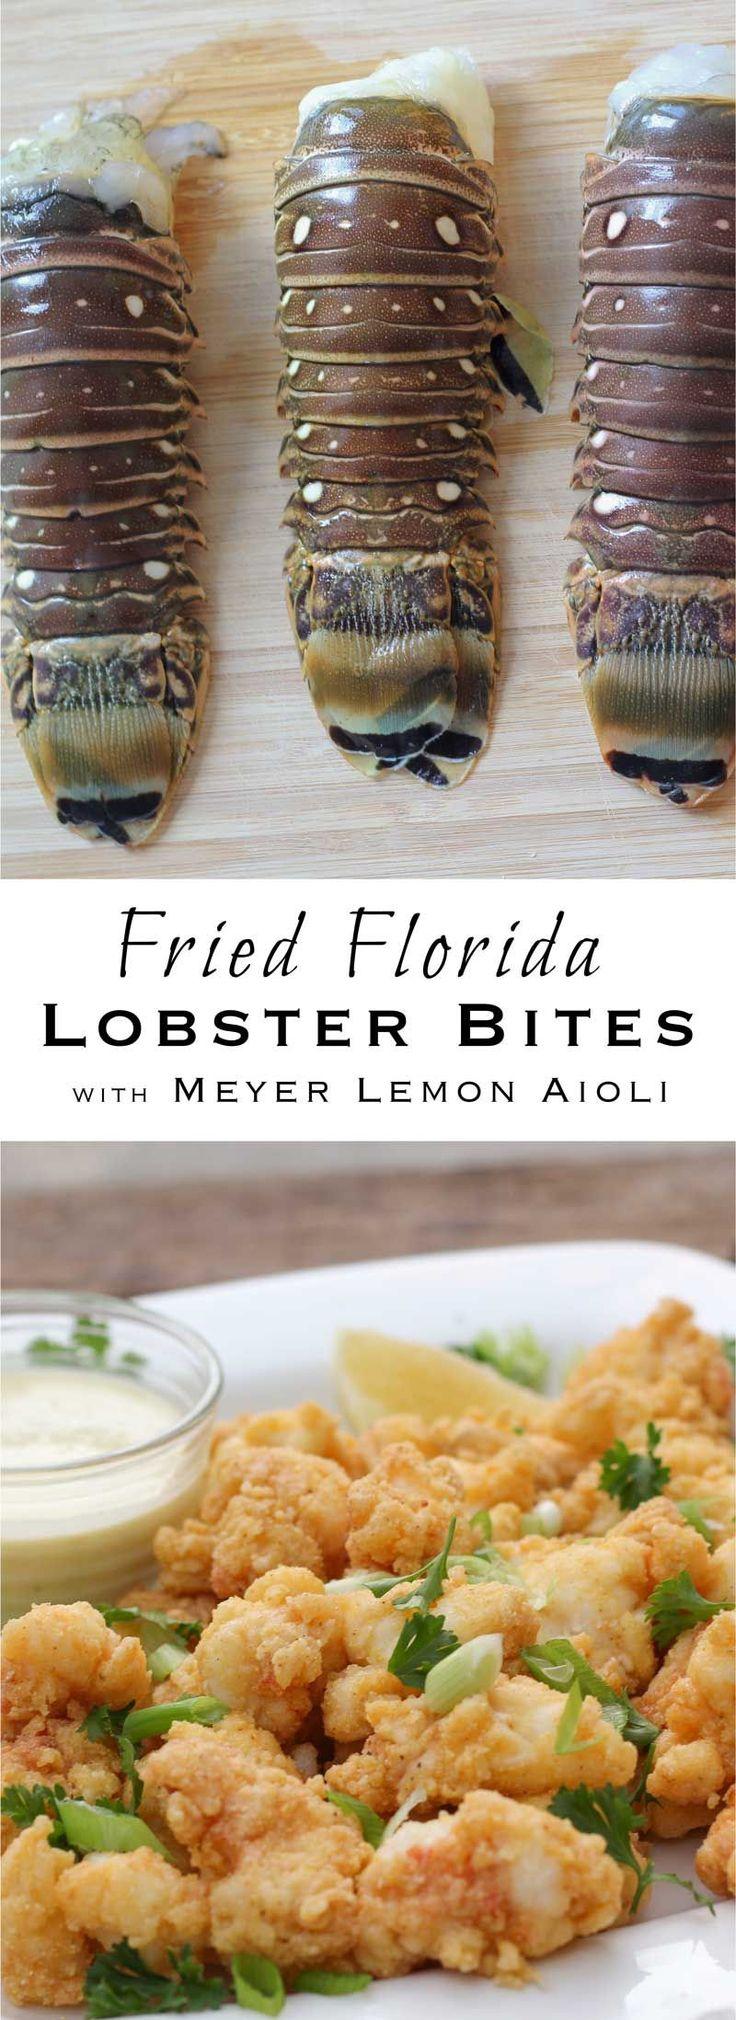 Fried Florida Lobster Bites with Meyer Lemon Aioli